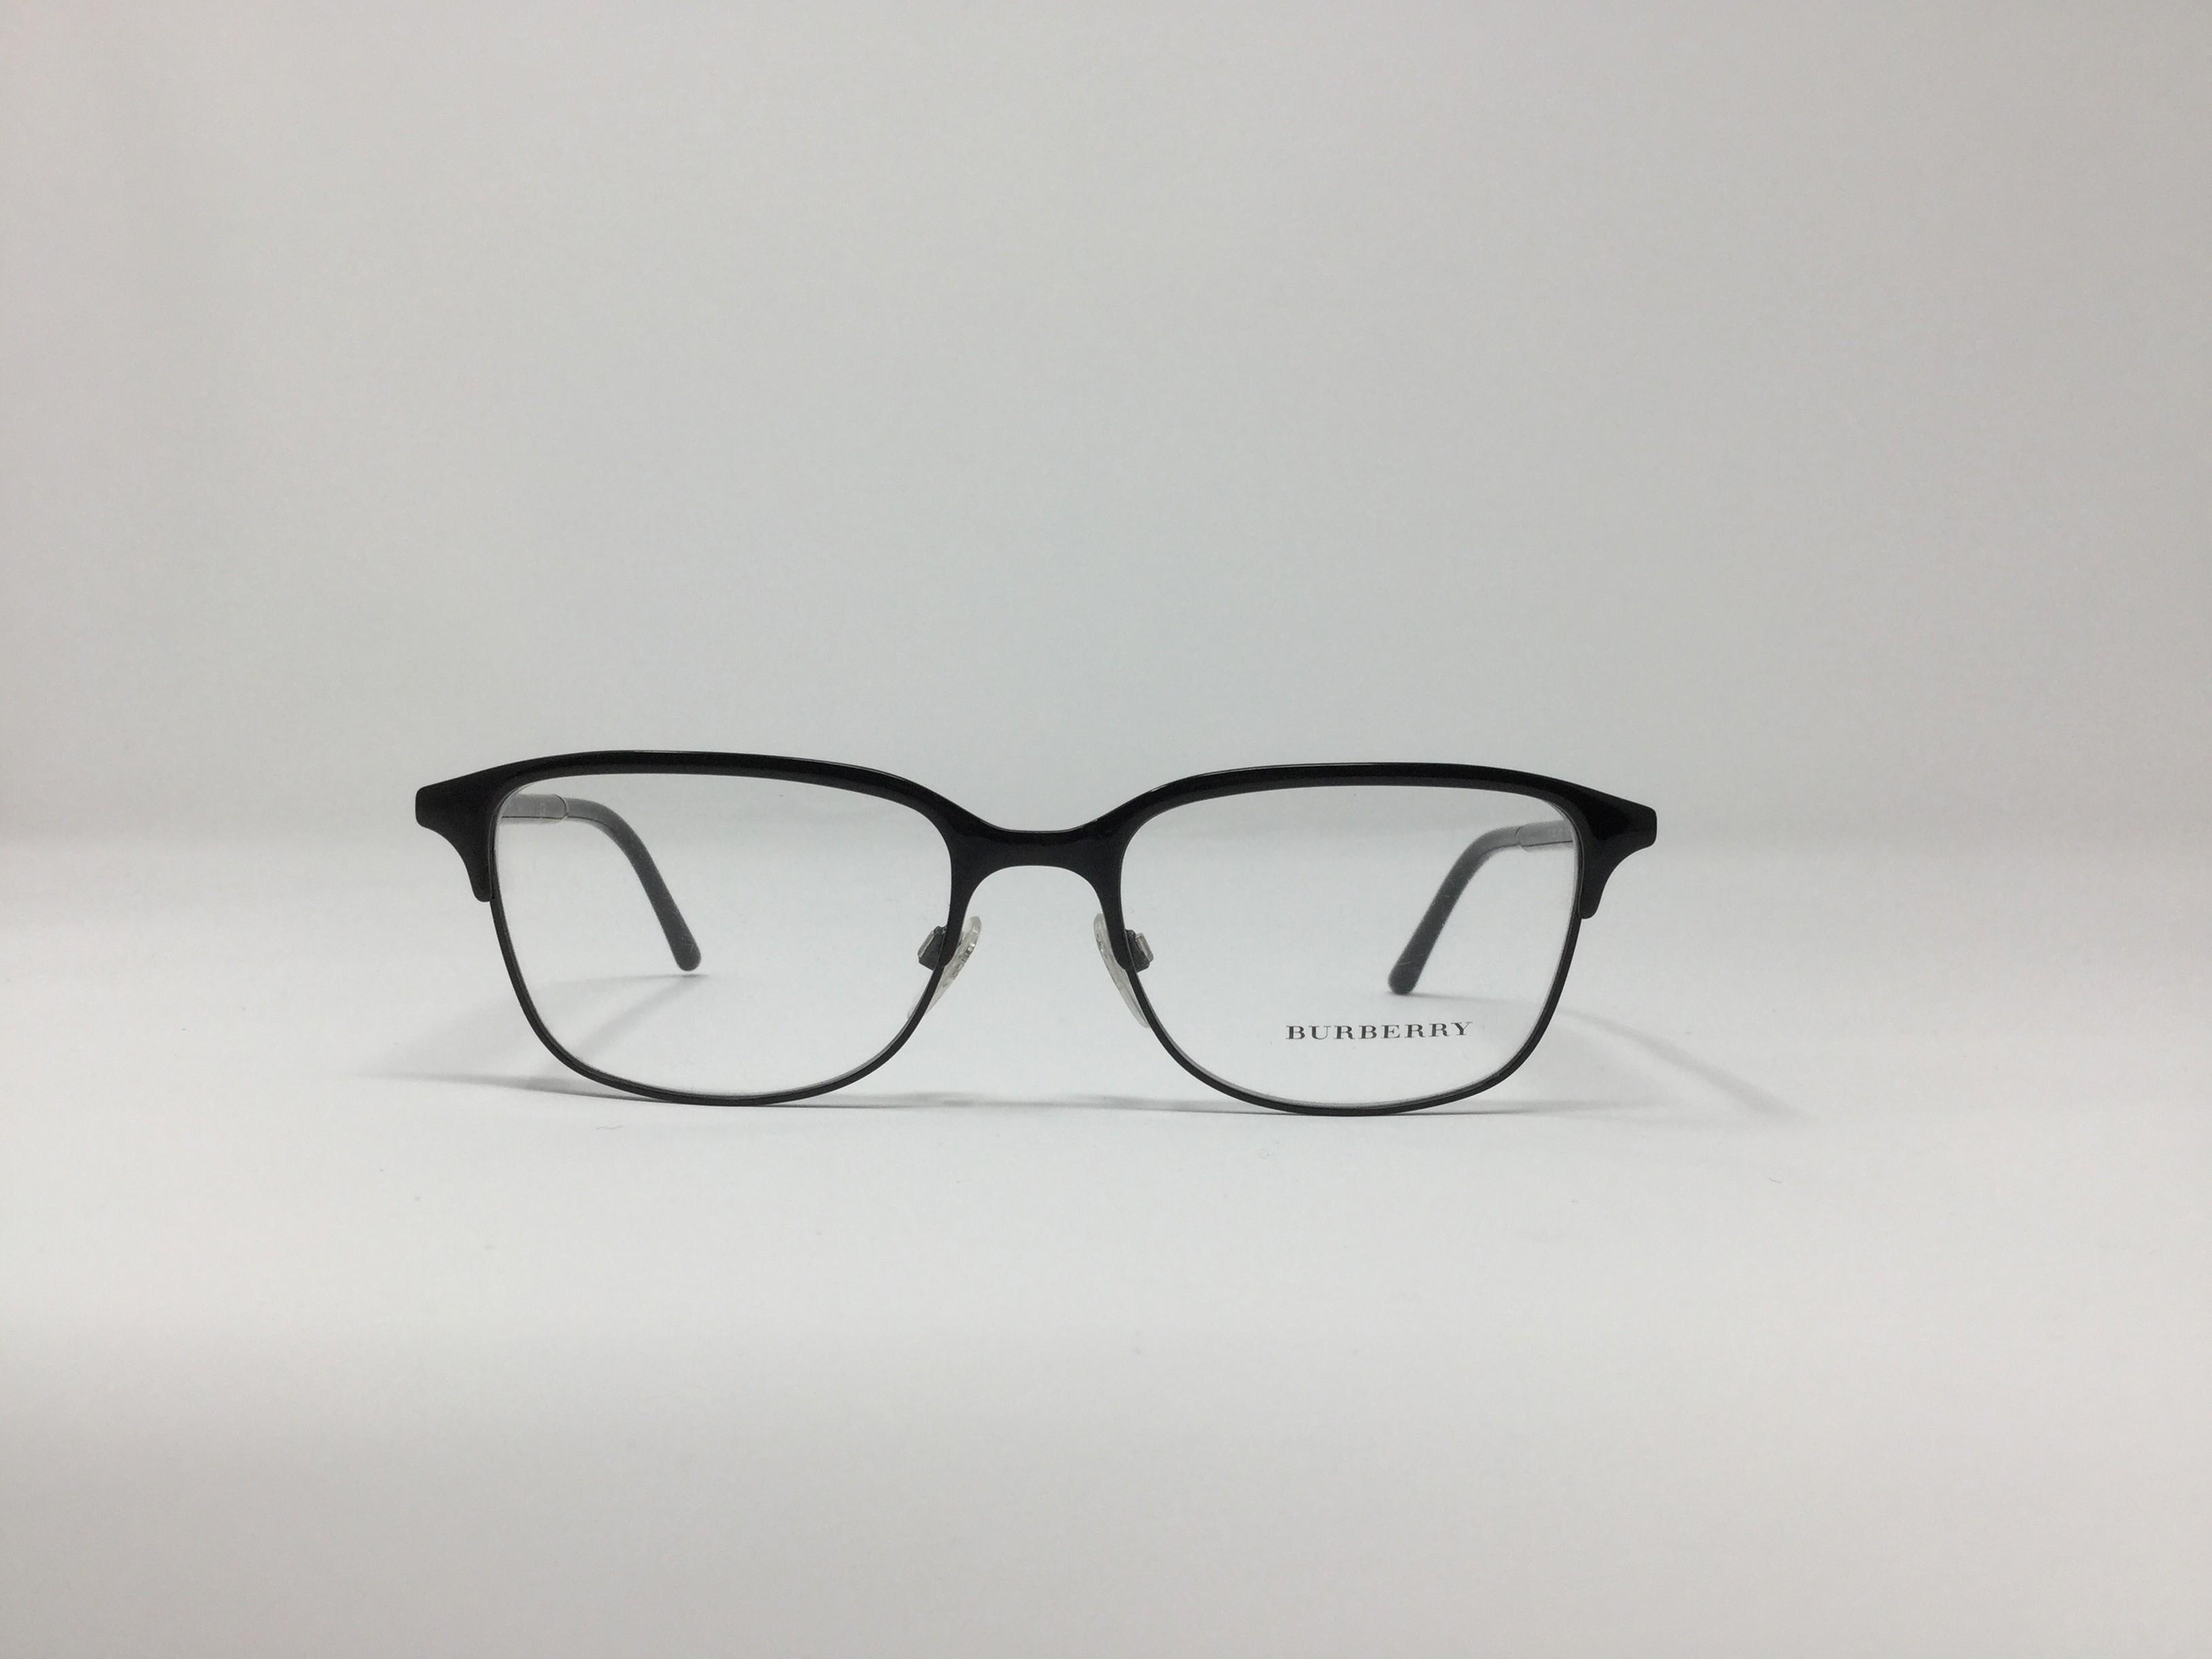 Burberry B1250 Mens Eyeglasses - Men - Eyeglasses